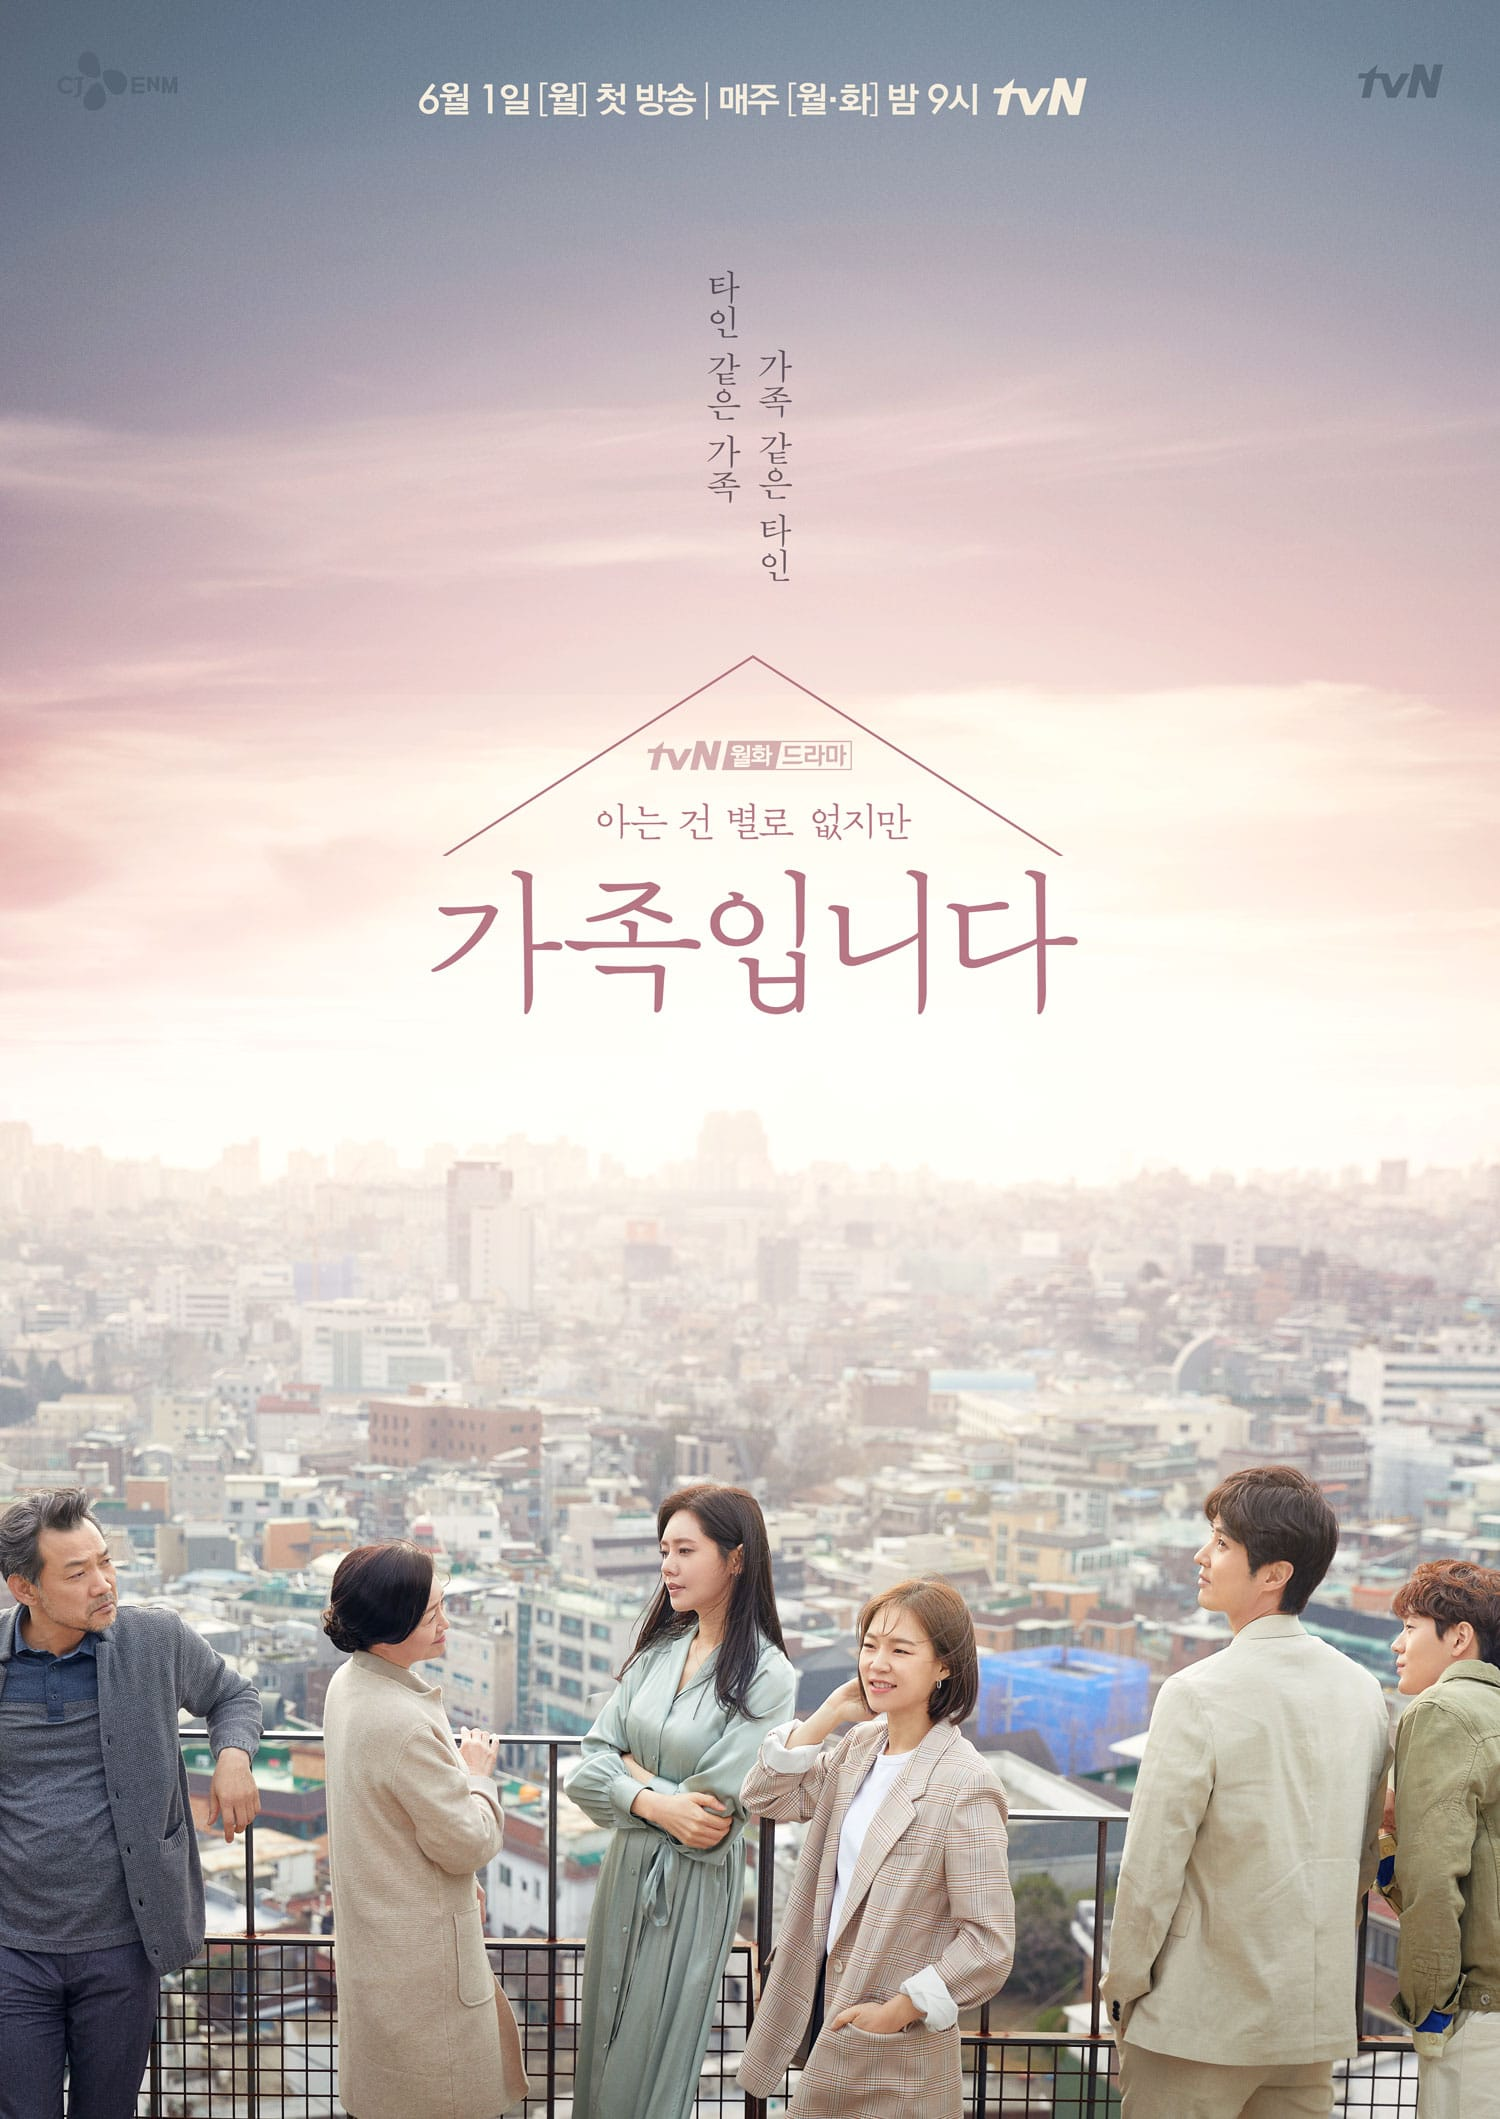 "2020 My Unfamiliar Family الدراما الكورية ""عائلتي الغير مألوفة"". تقرير عن الدراما + الأبطال + جميع الحلقات مترجمة أونلاين . مسلسل عائلتي غير مألوفة مترجم"